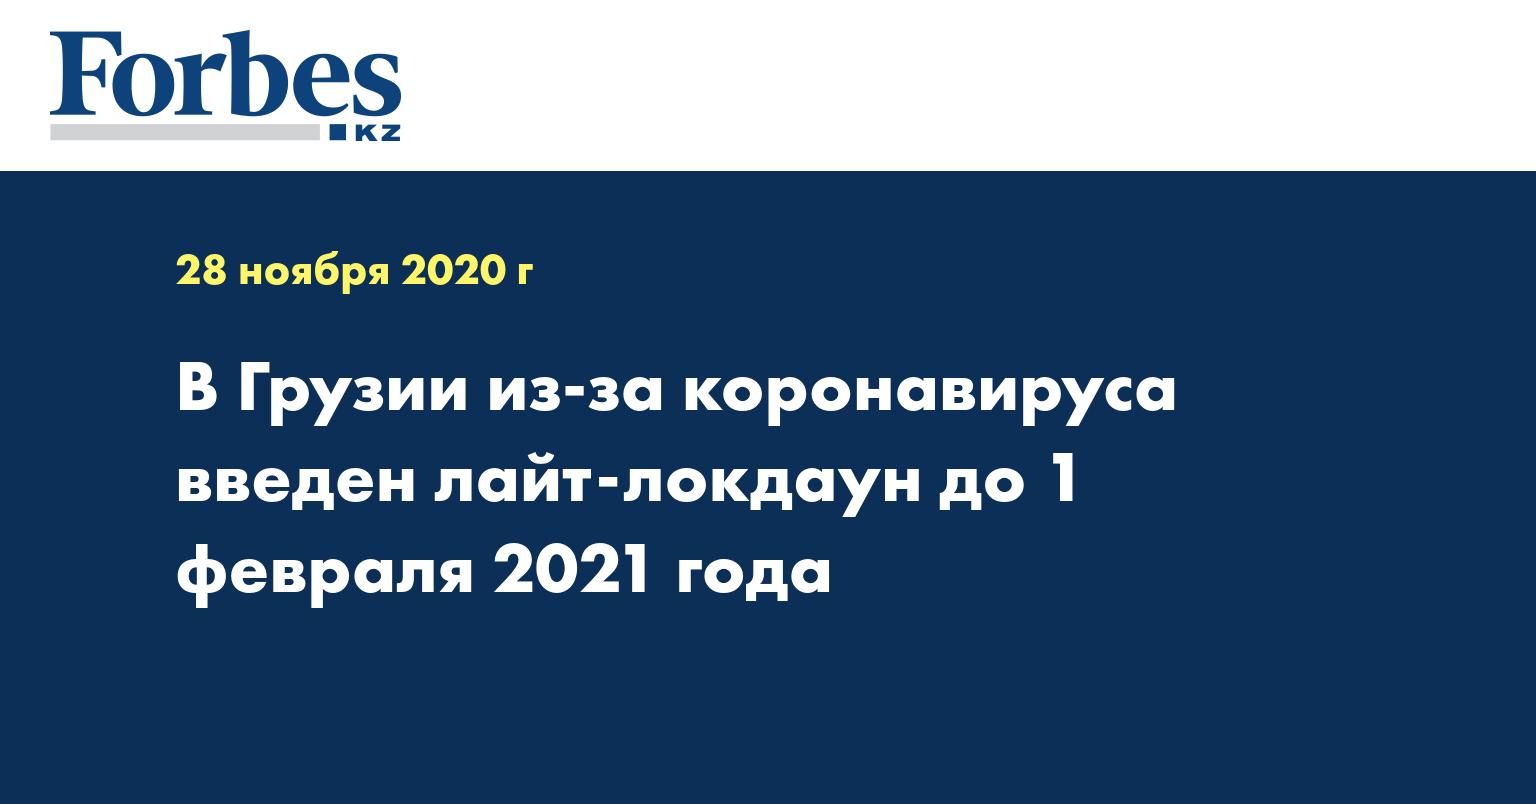 В Грузии из-за коронавируса введен лайт-локдаун до 1 февраля 2021 года